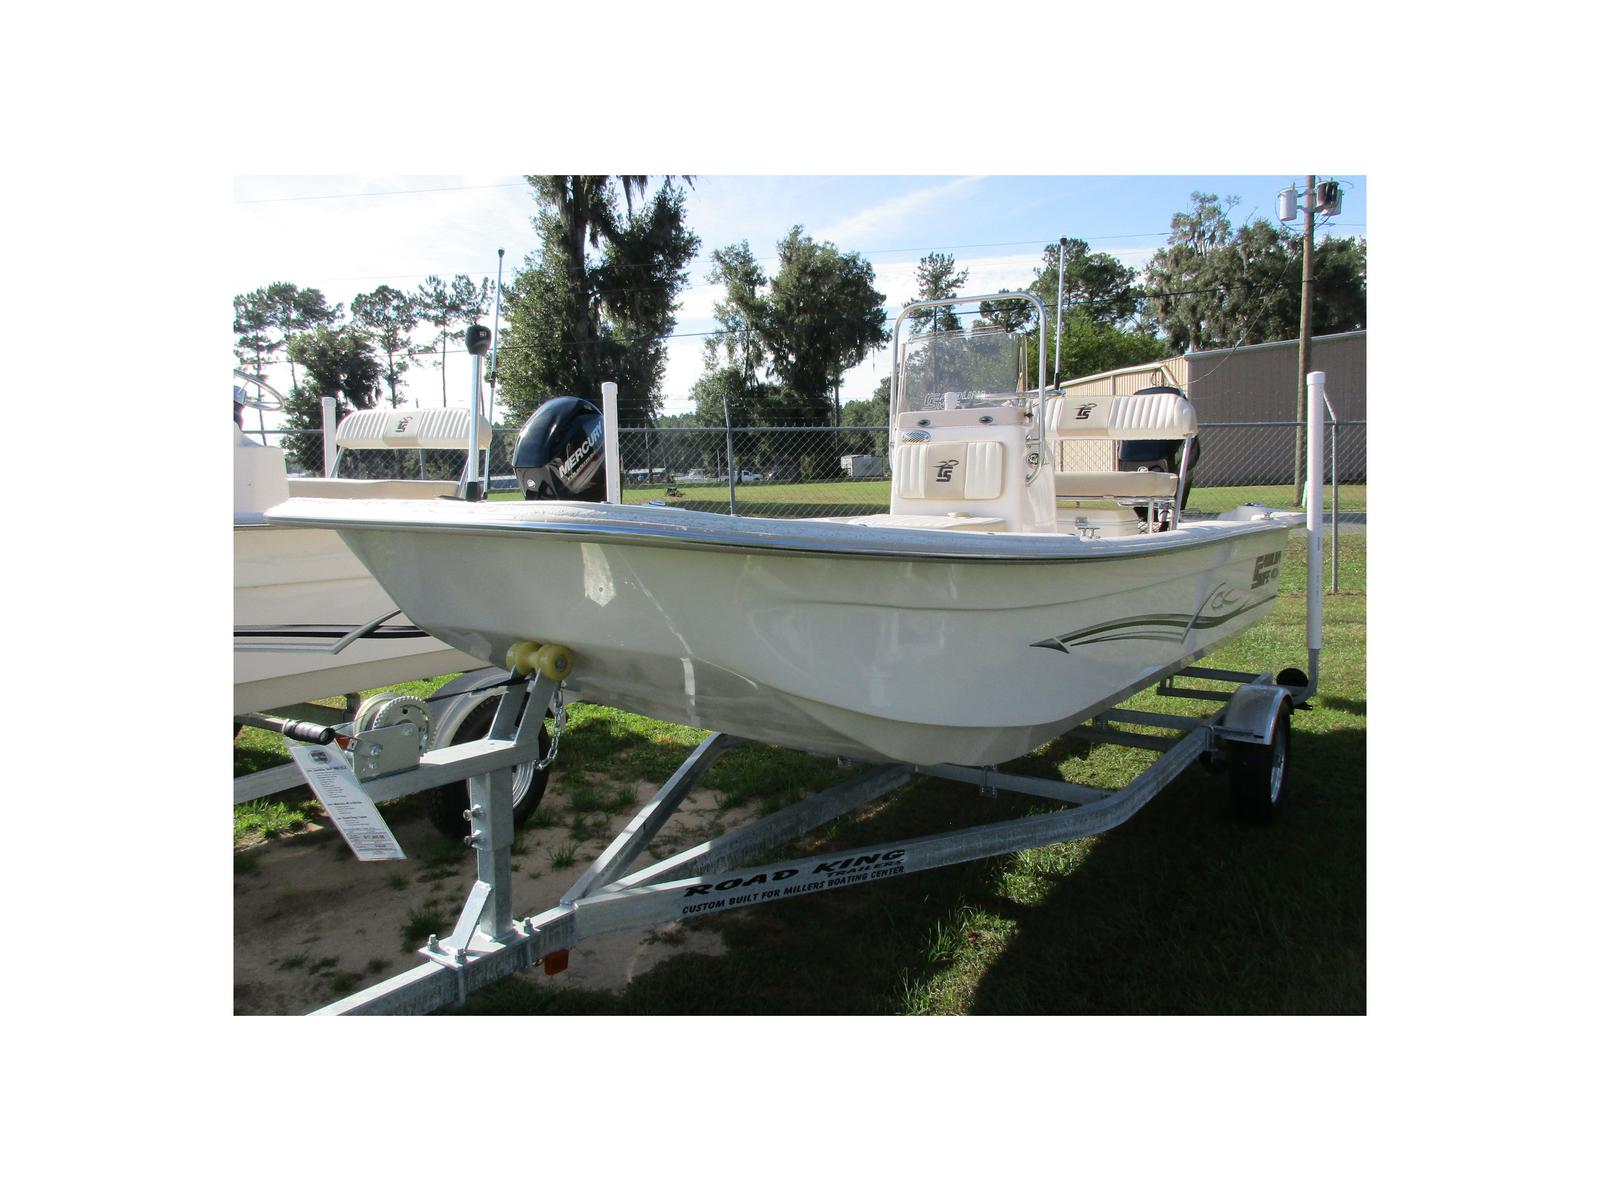 2019 carolina skiff 1655 dlx - millers boating center